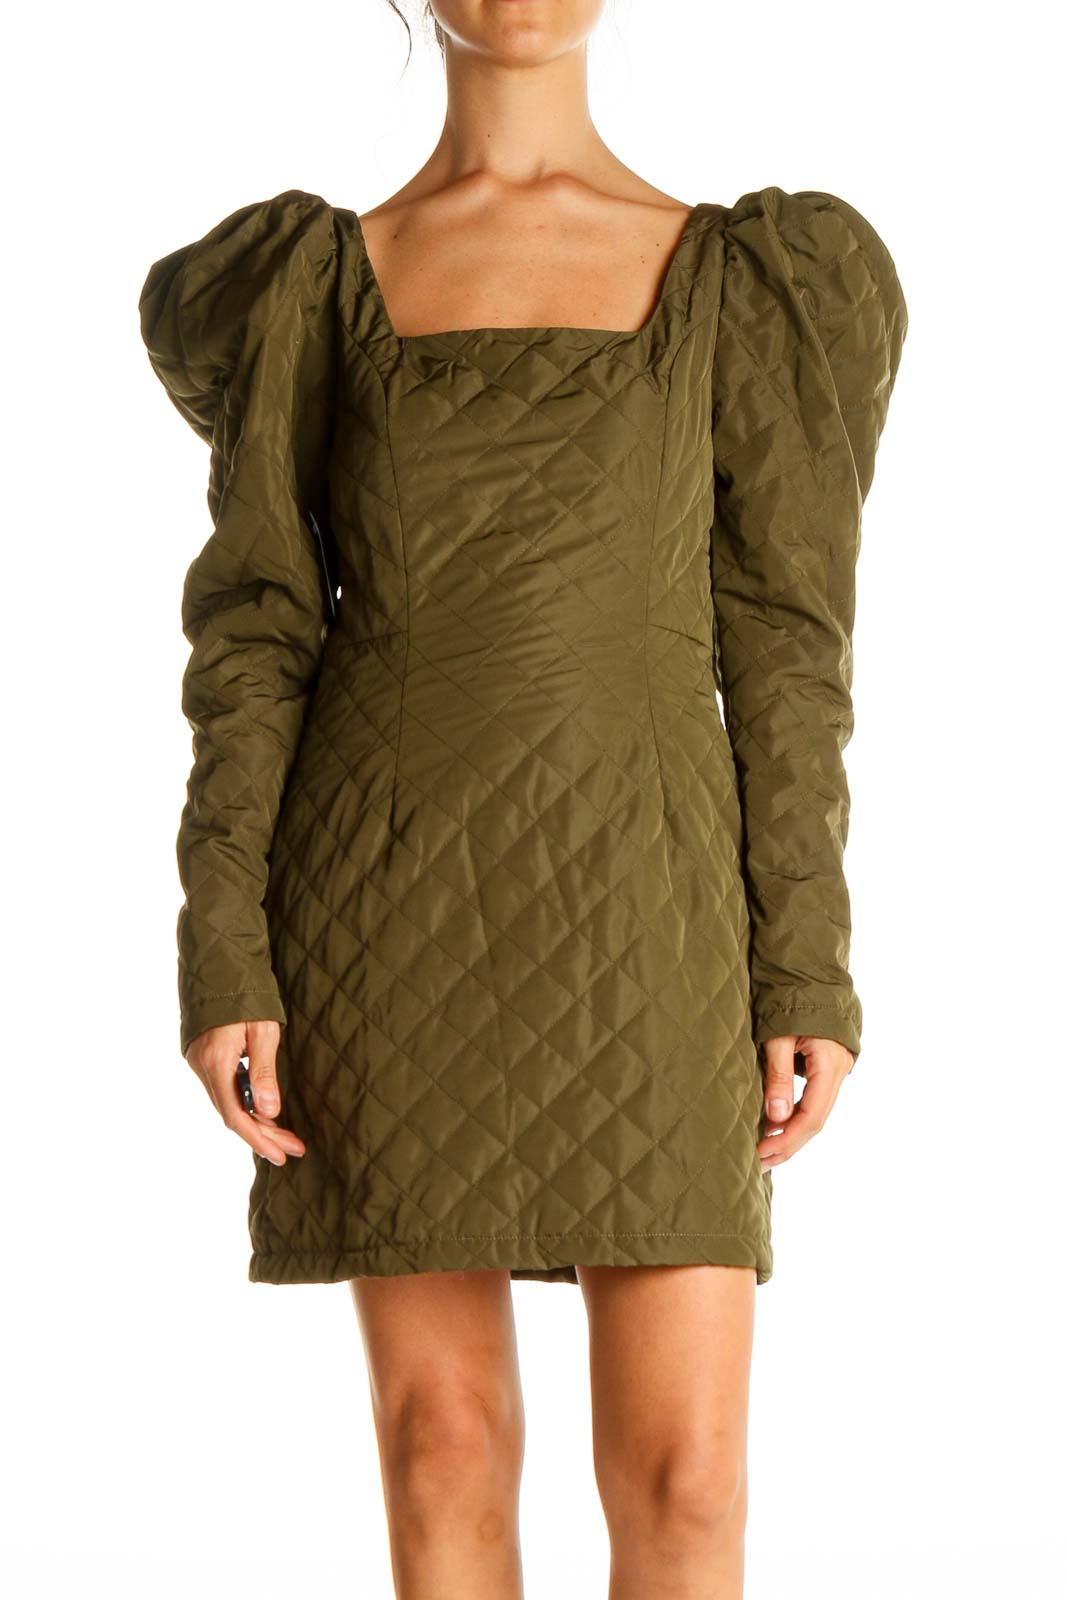 Green Solid Retro Sheath Dress Front